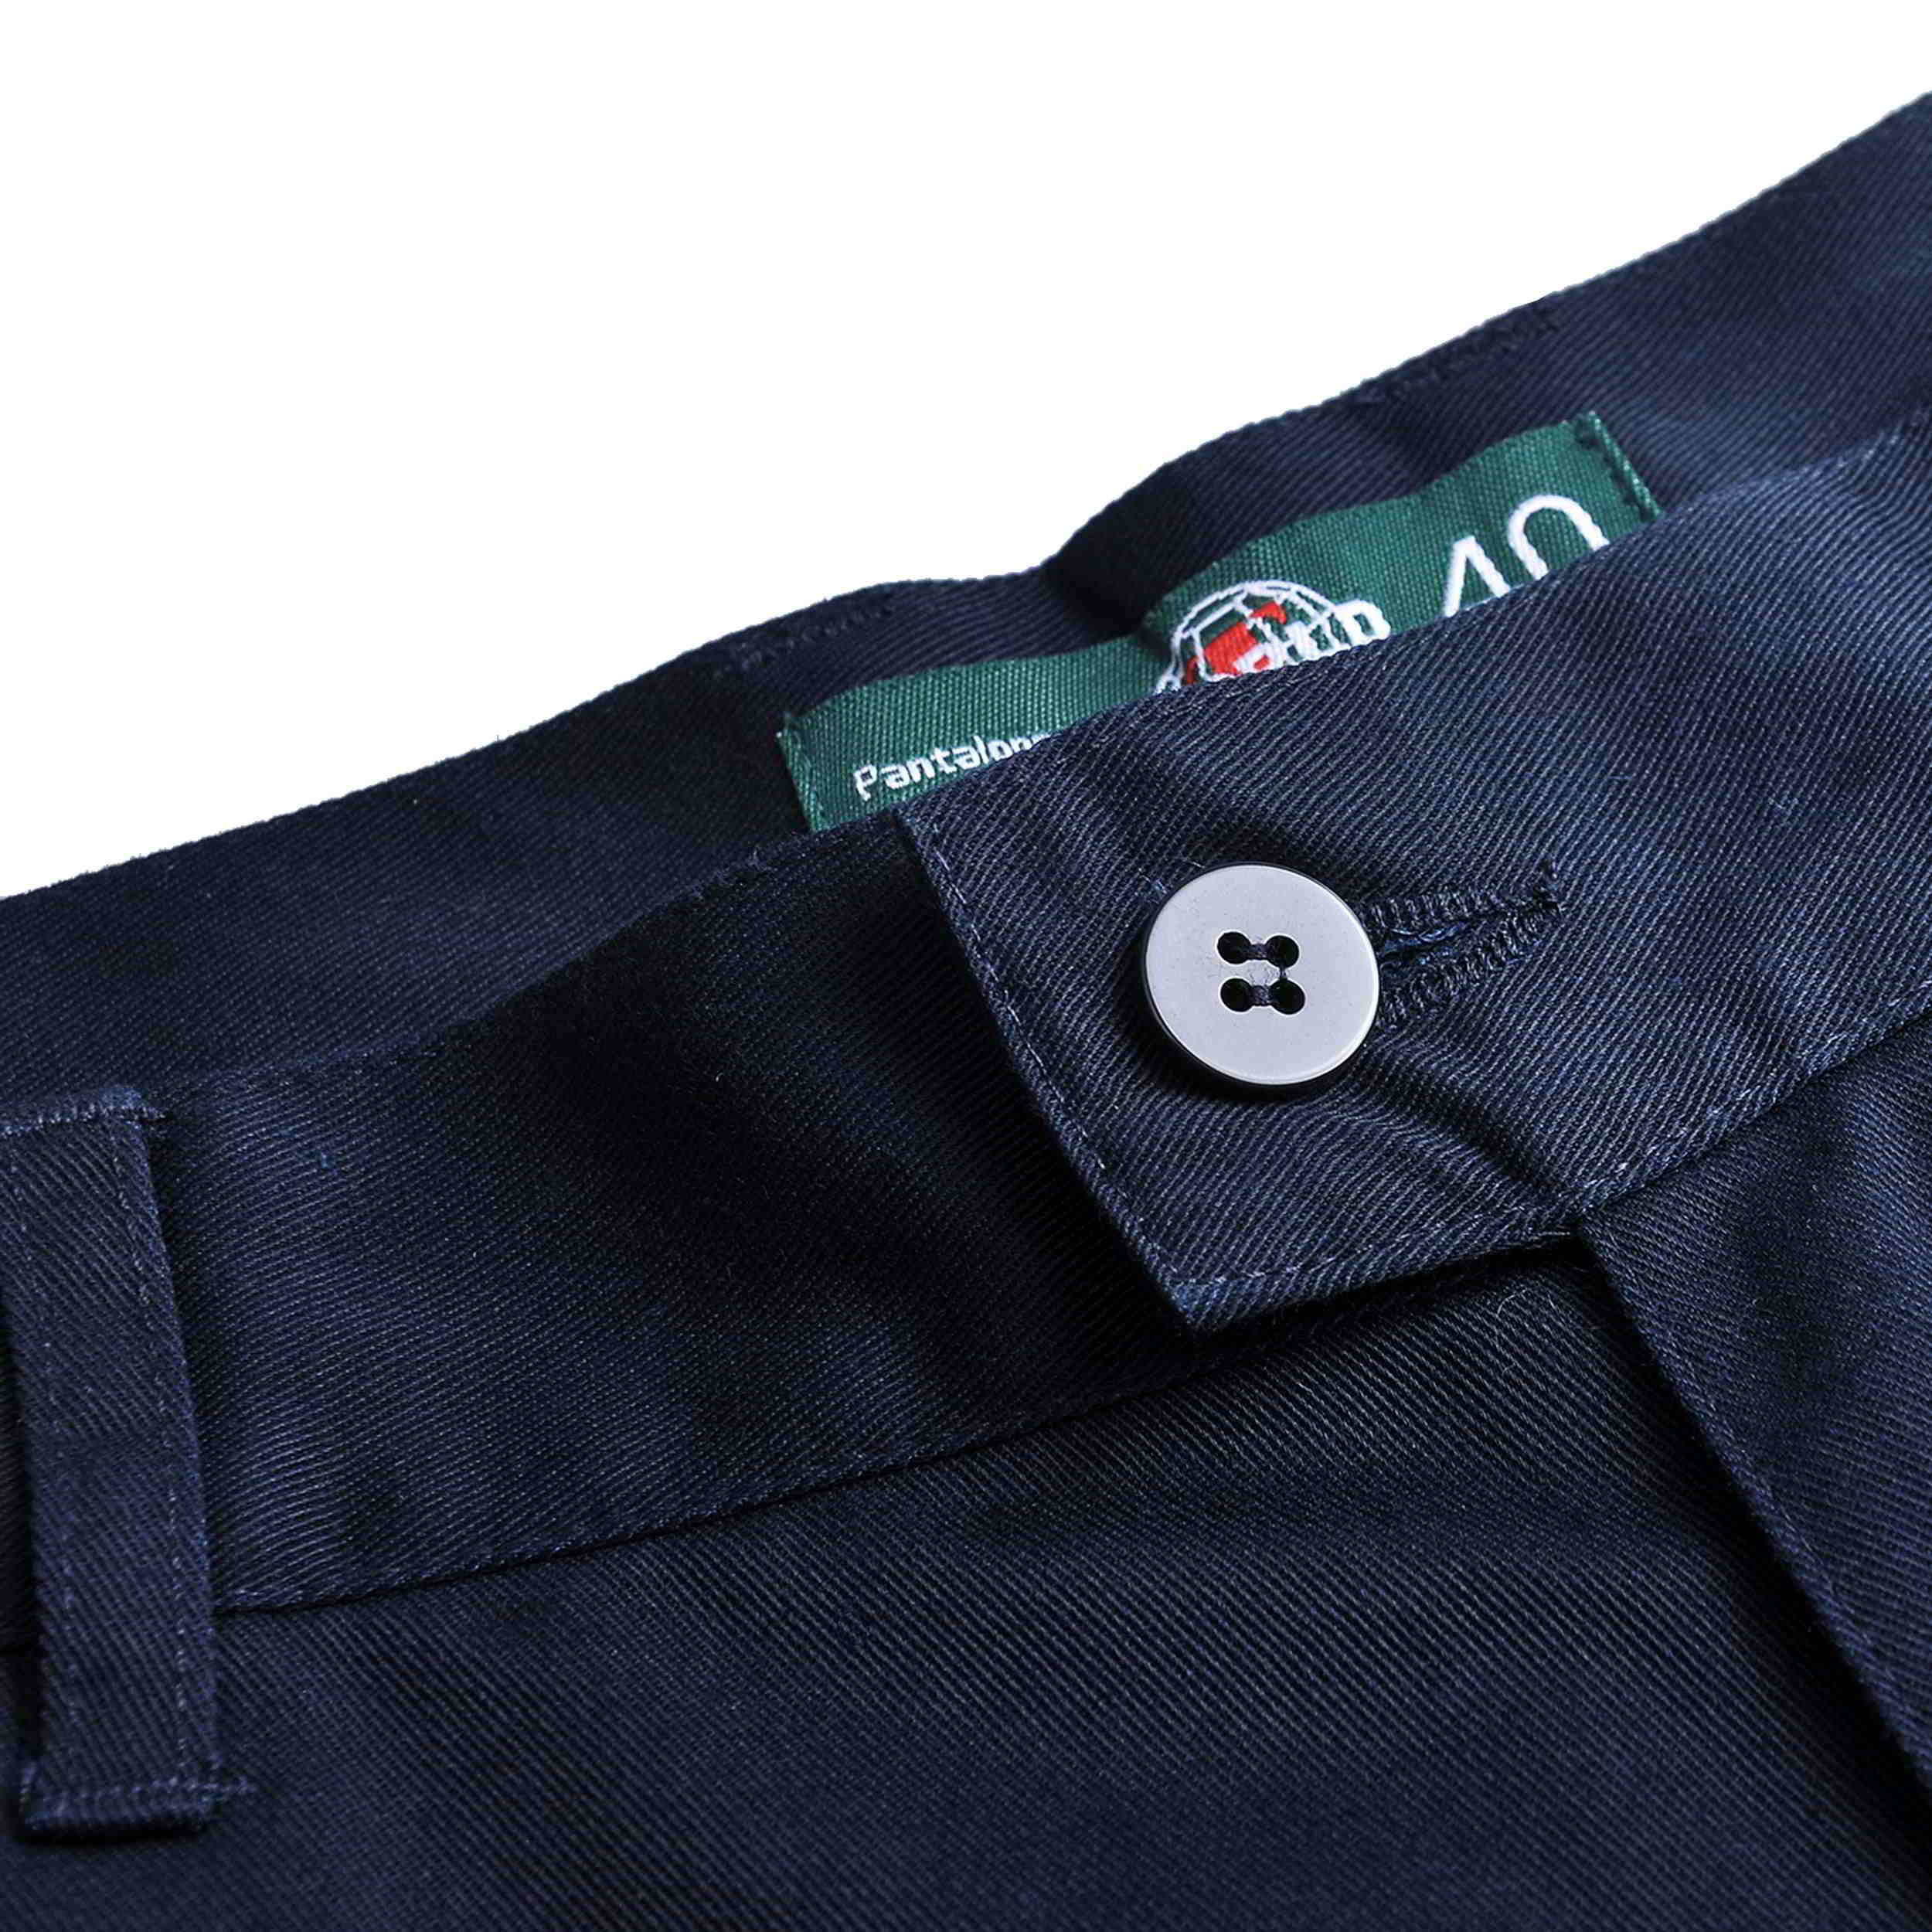 Pantalon Vestir Classic Gabardina Hombre Portal Ropa Empresas Cl